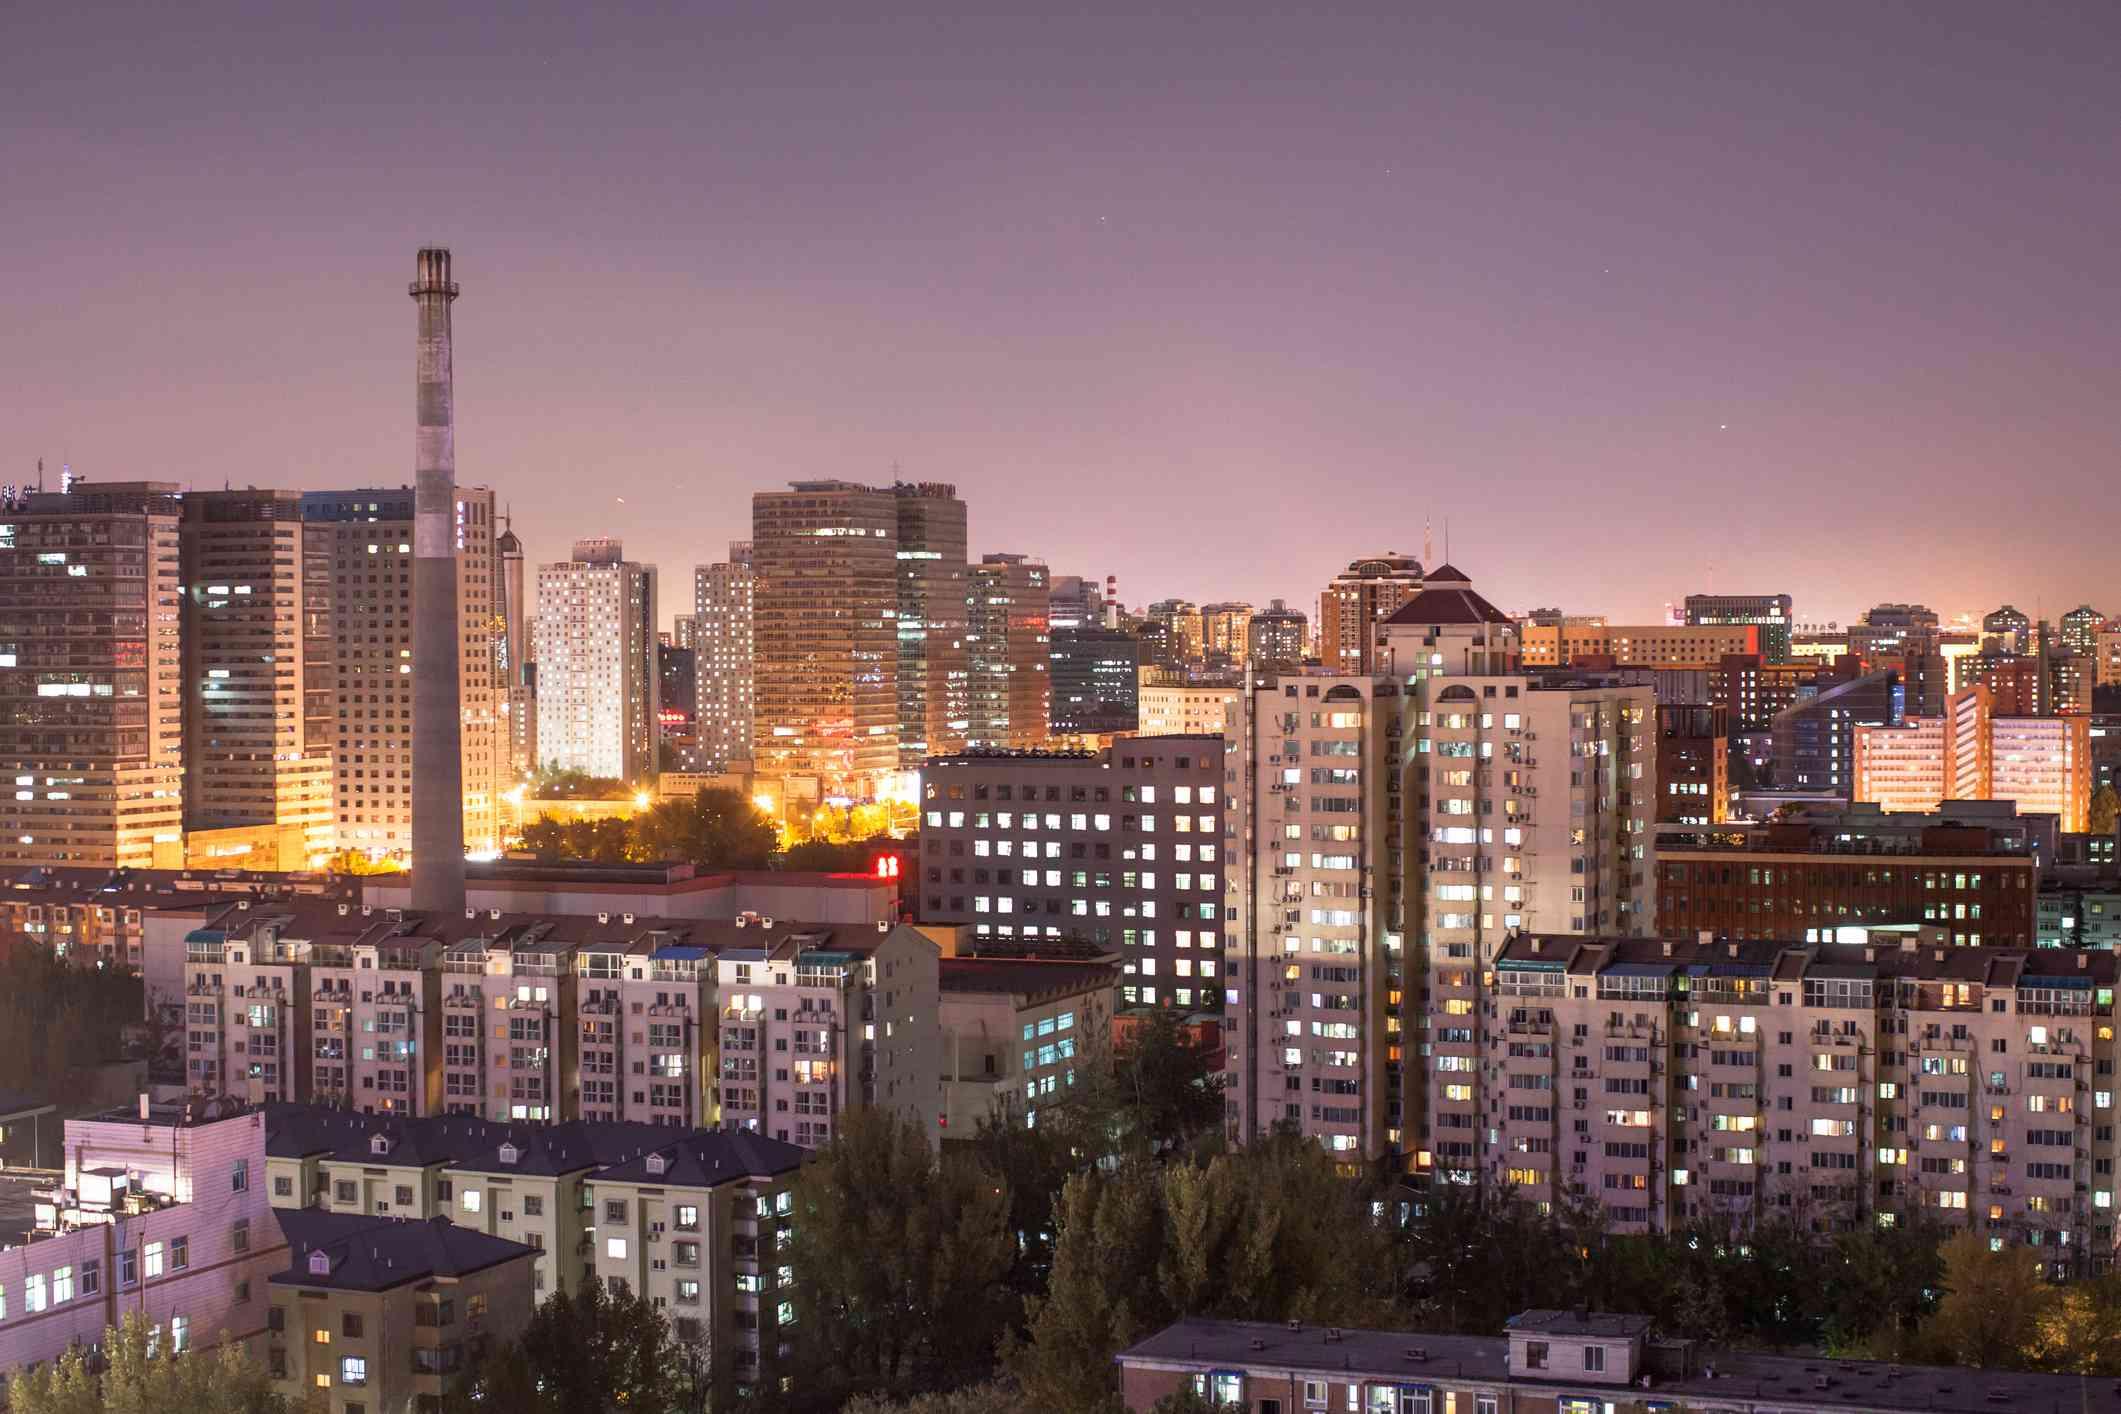 Wudaokou skyline